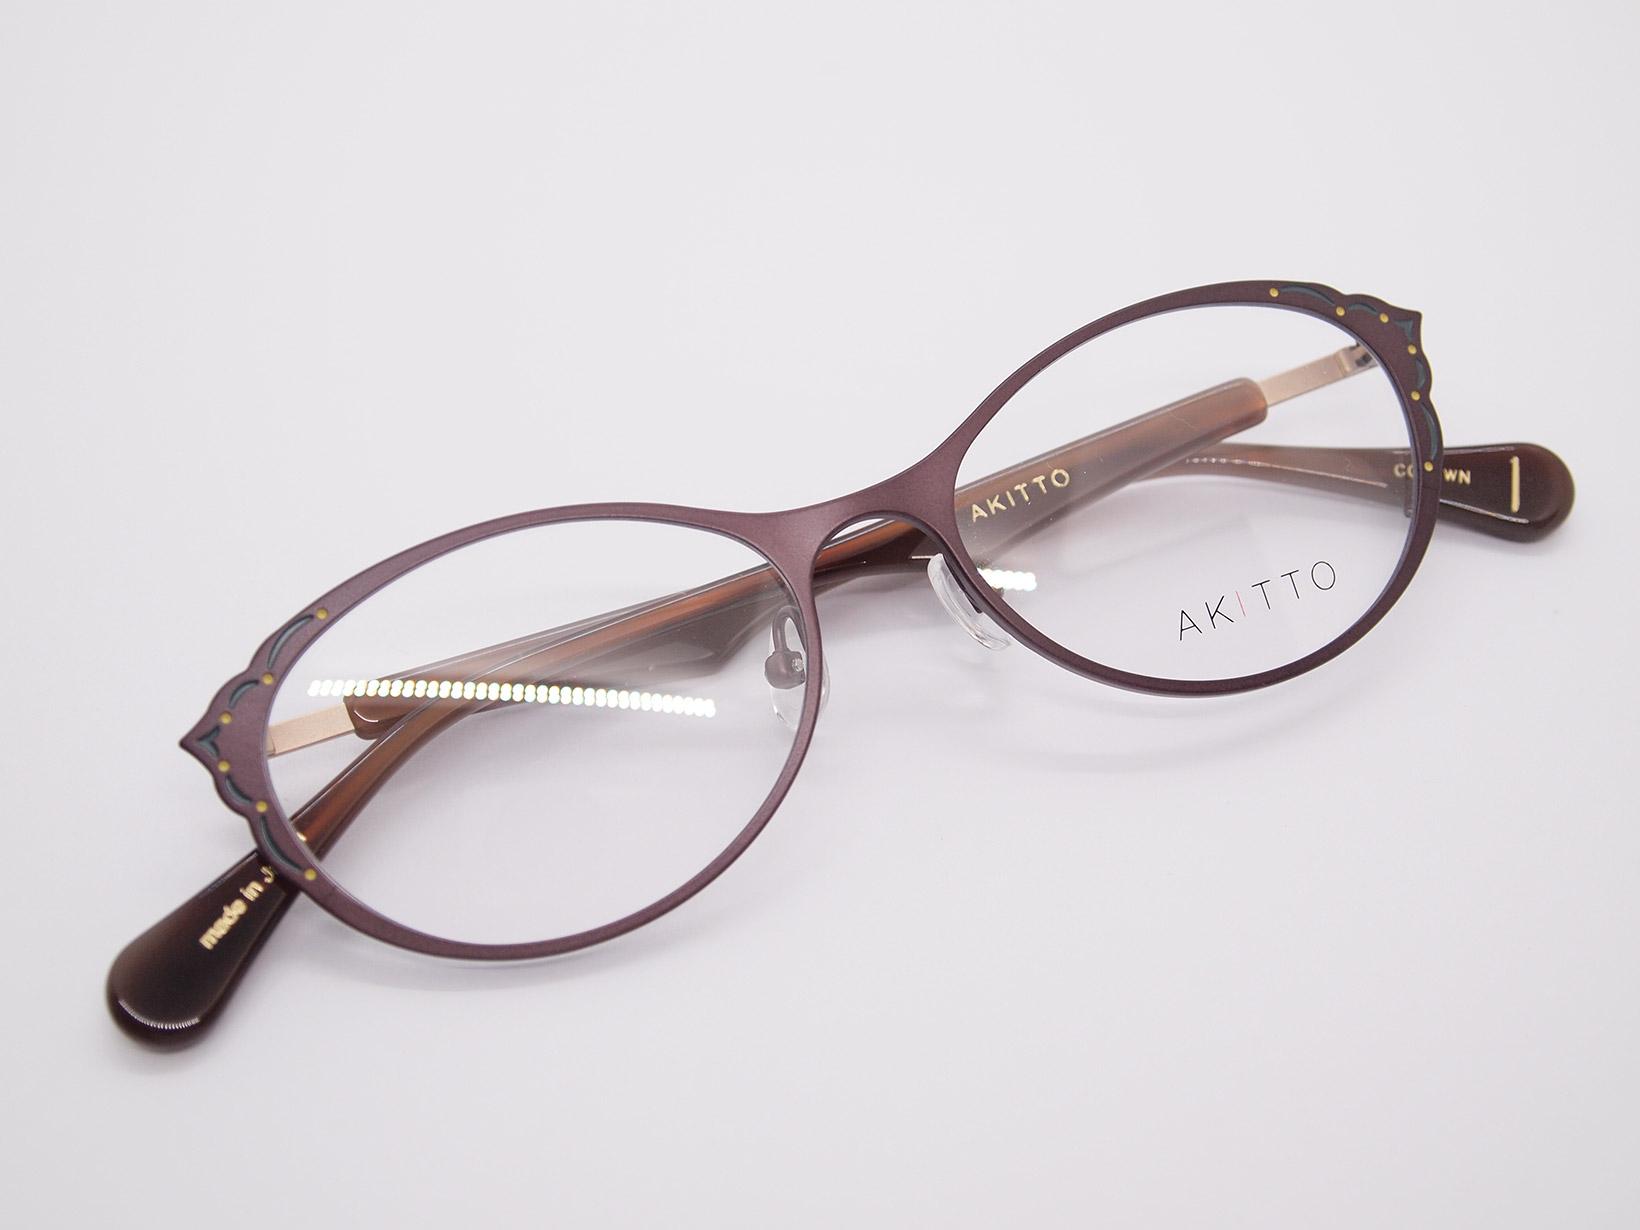 AKITTO 2020-4th mal color|WN size:51□16 material:titanium+enamel+acetate price:¥44,500-(+tax)